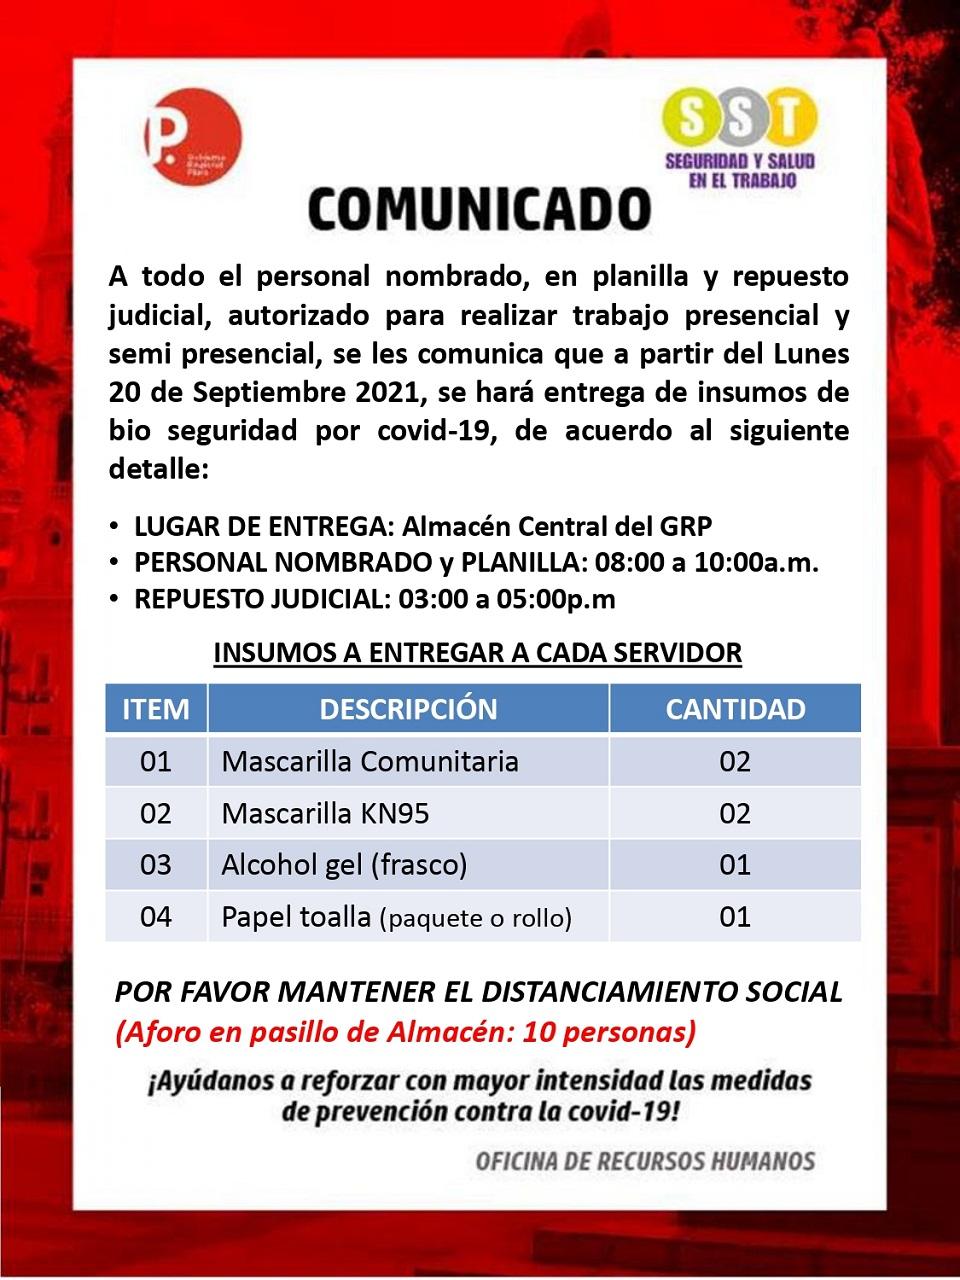 COMUNICADO ENTREGA DE INSUMOS POR COVID-19